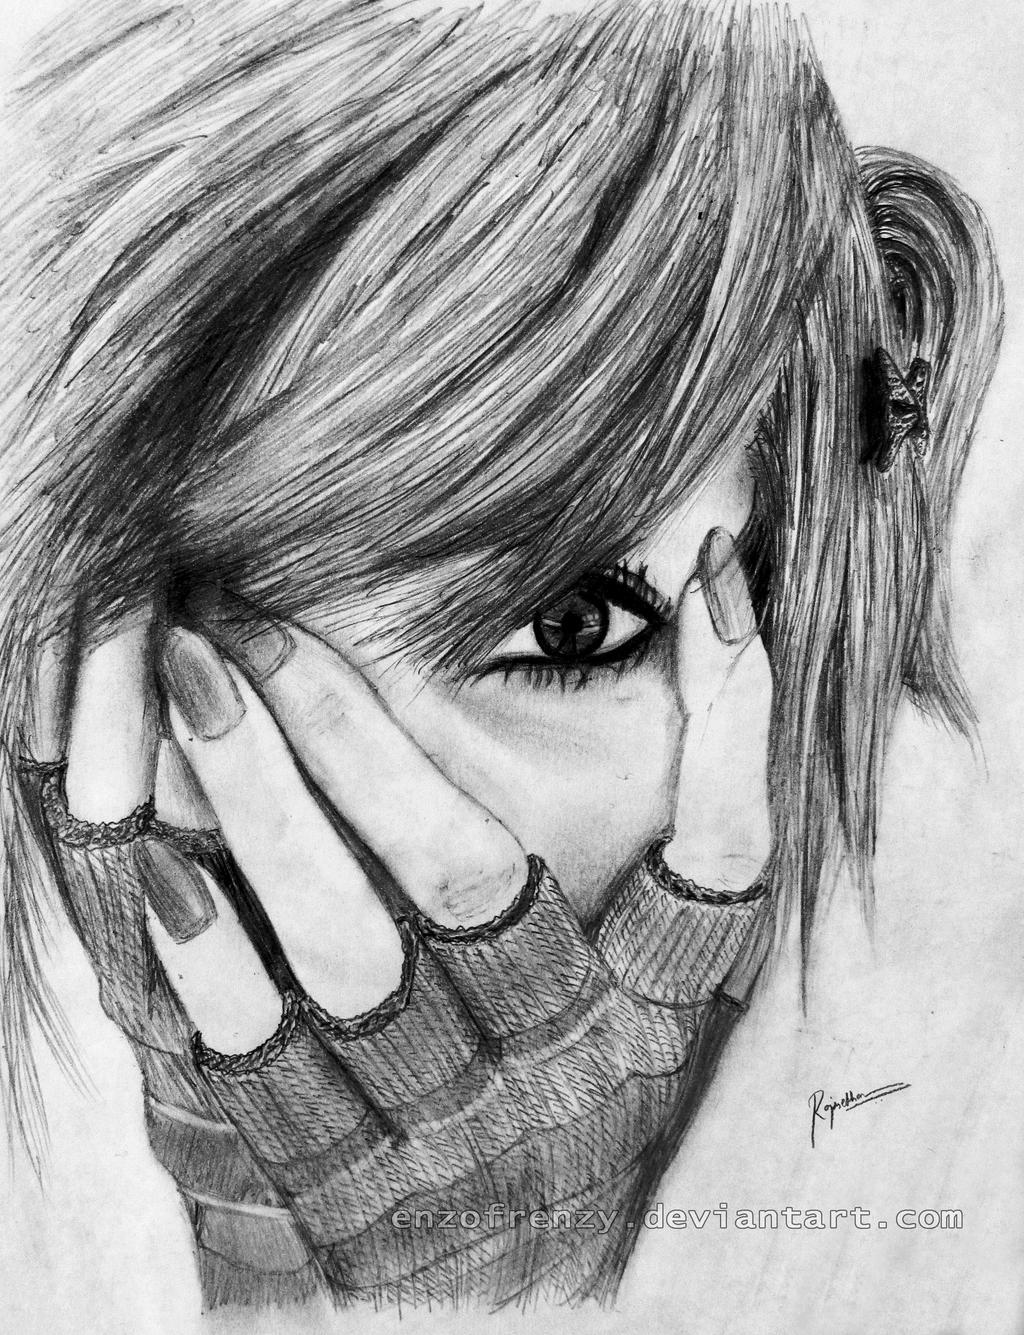 Drawings Of People Crying Best Drawings Of People People Sketches